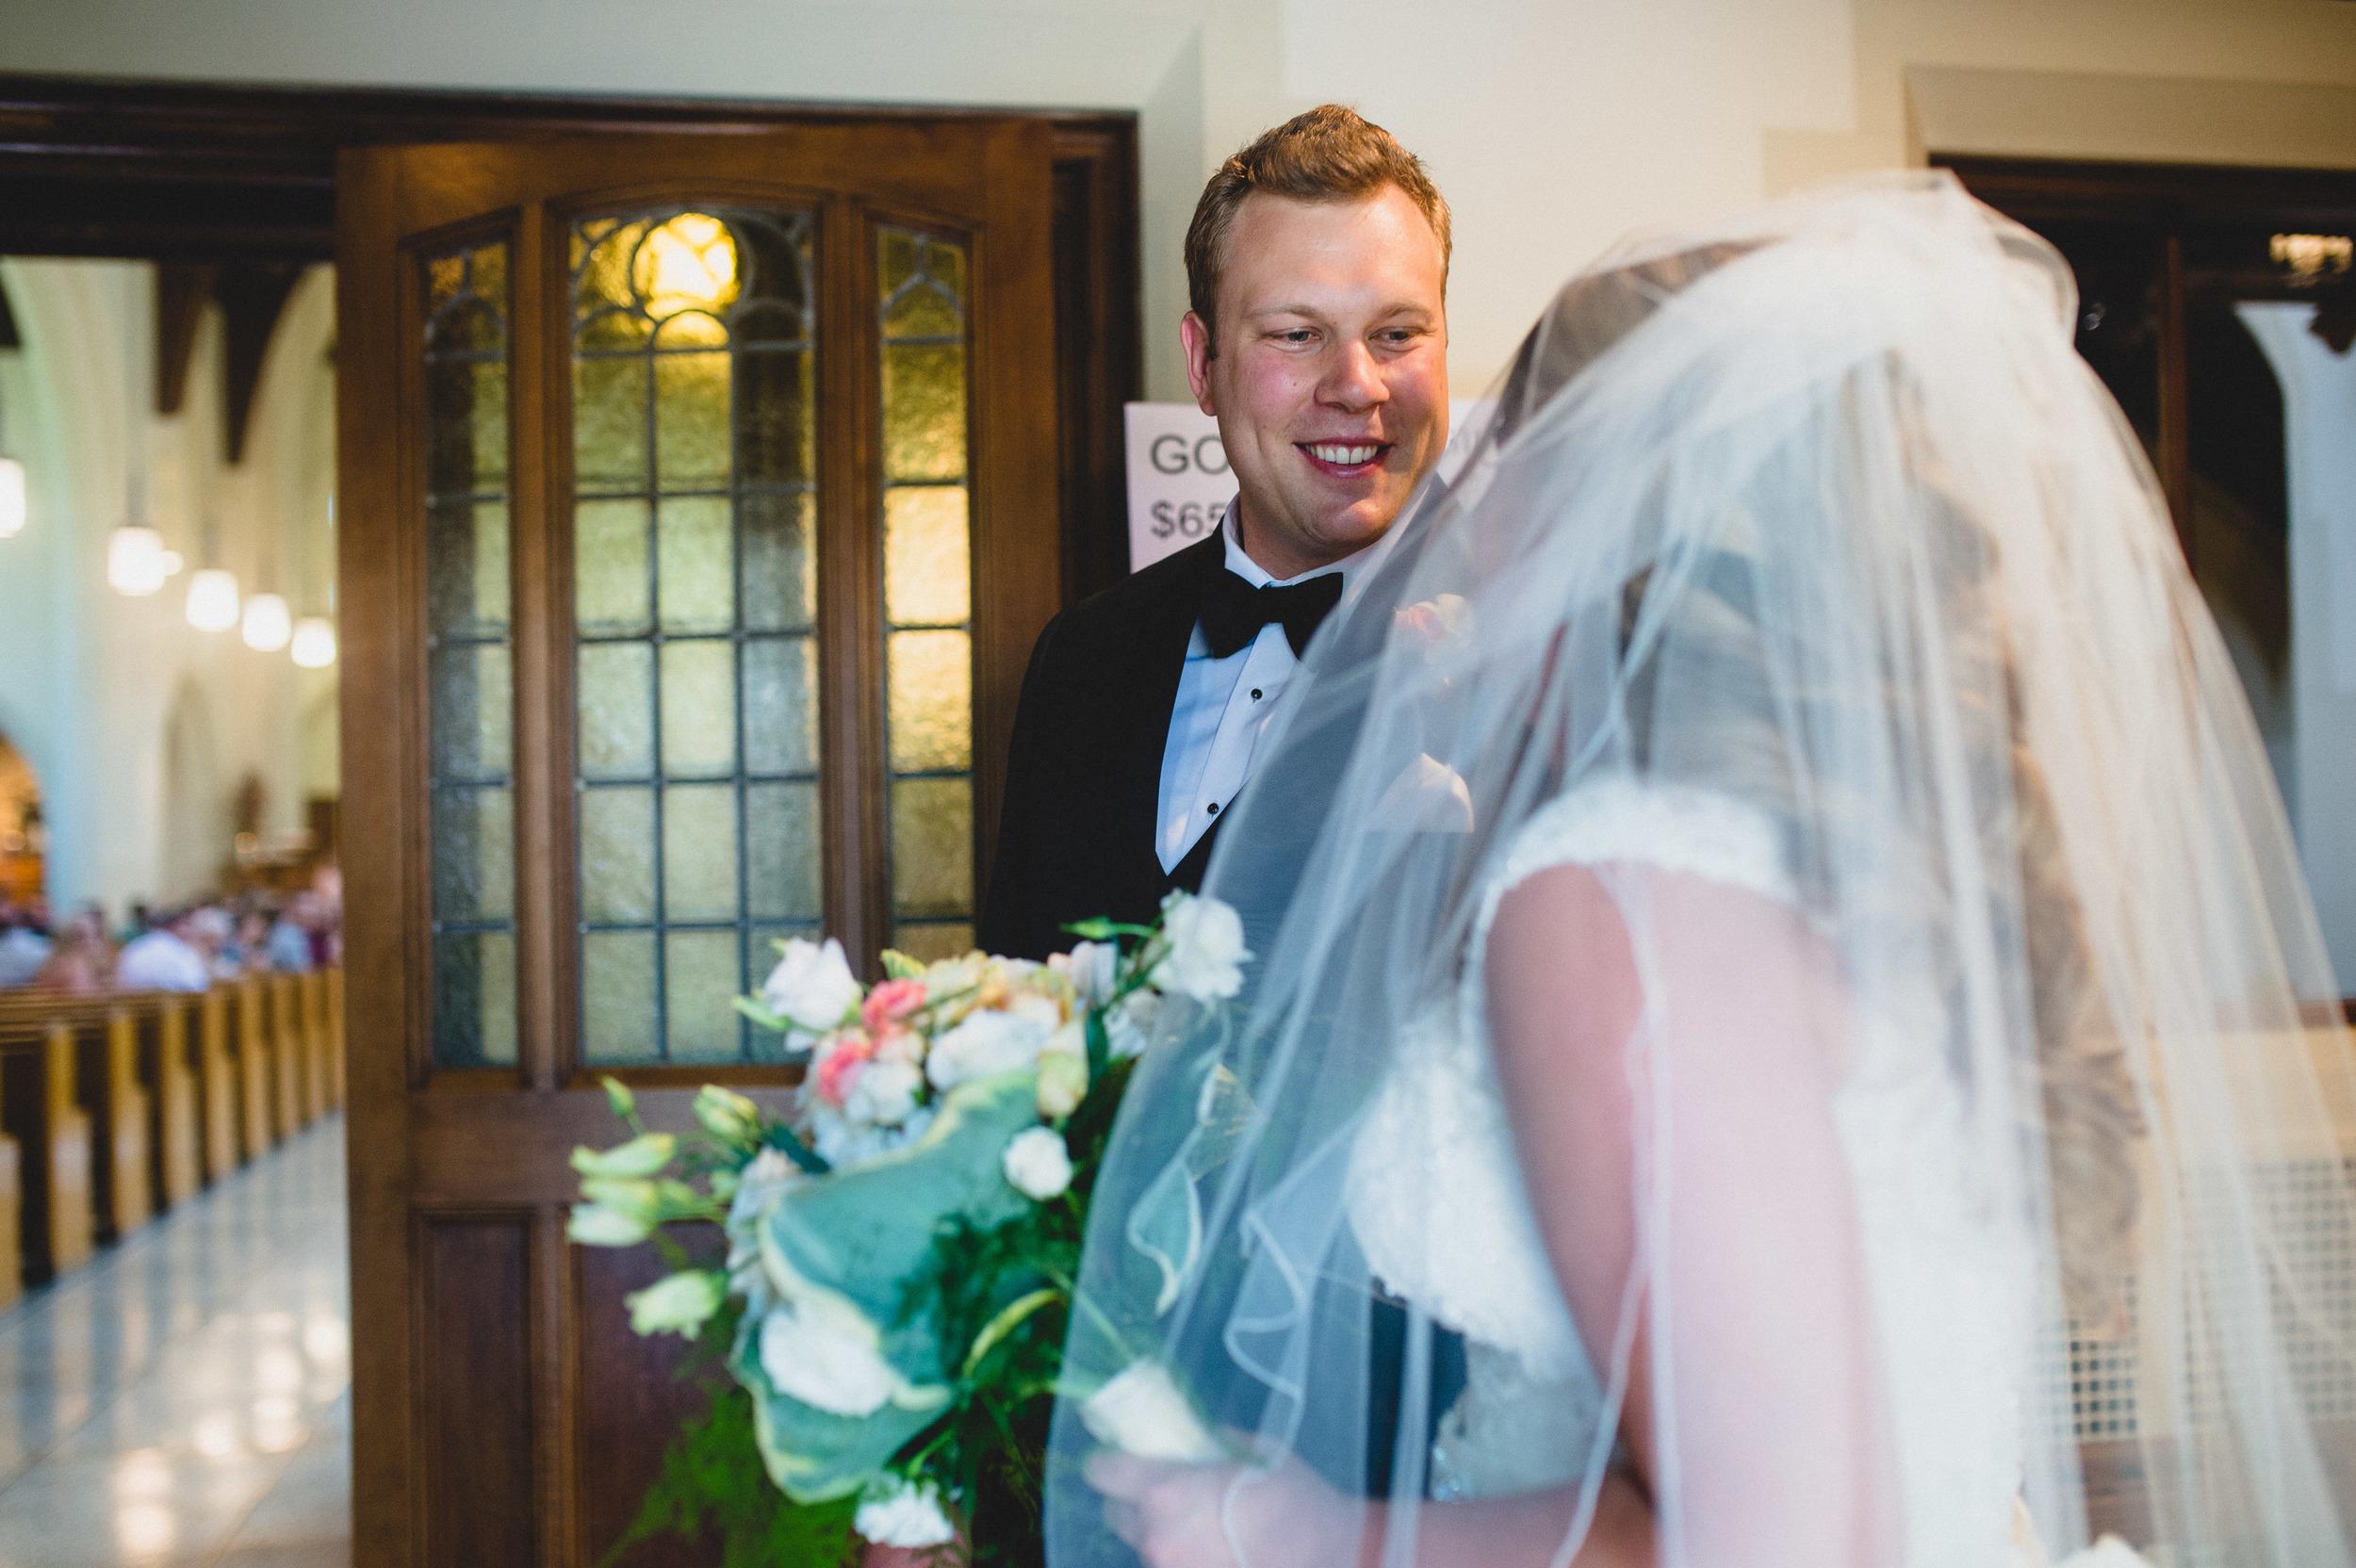 Vancouver St Augustine 's Church wedding photographer edward lai photography-31.jpg